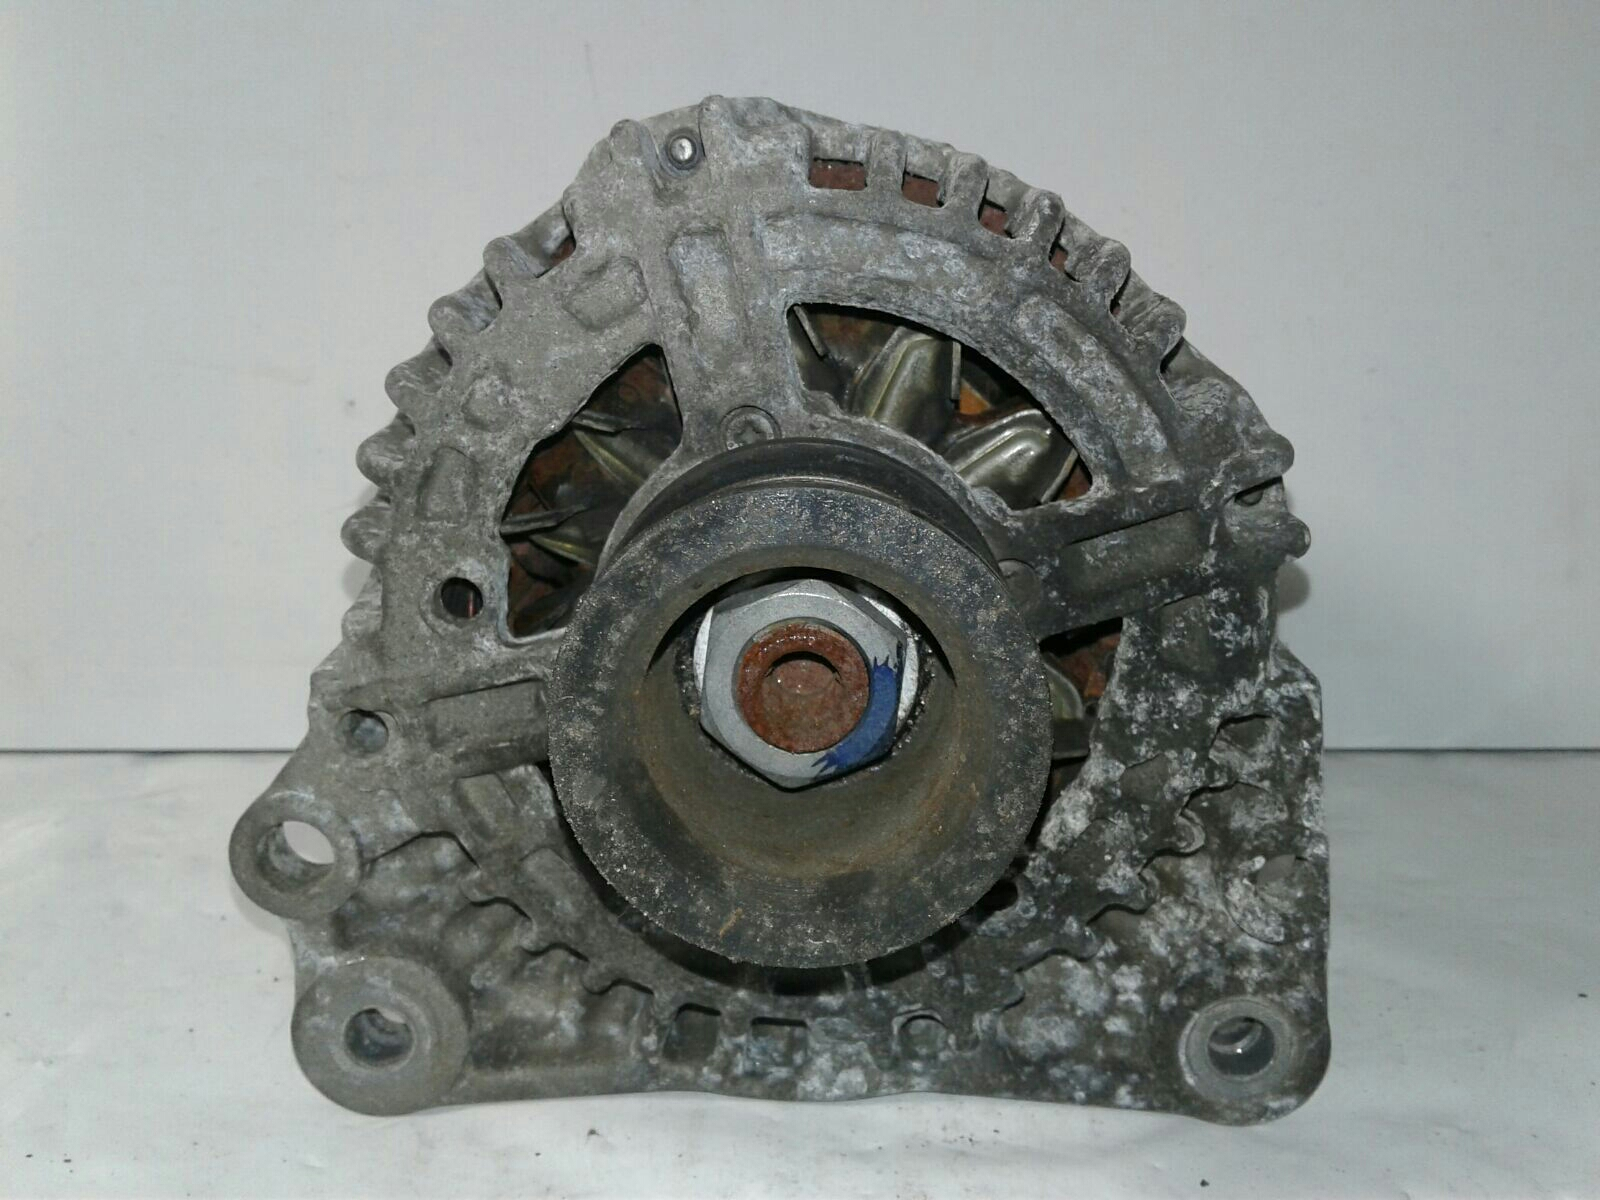 skoda fabia 2007 to 2010 alternator petrol manual for sale from rh motorhog co uk Chrysler Alternator Wiring Diagram Chevrolet Alternator Wiring Diagram